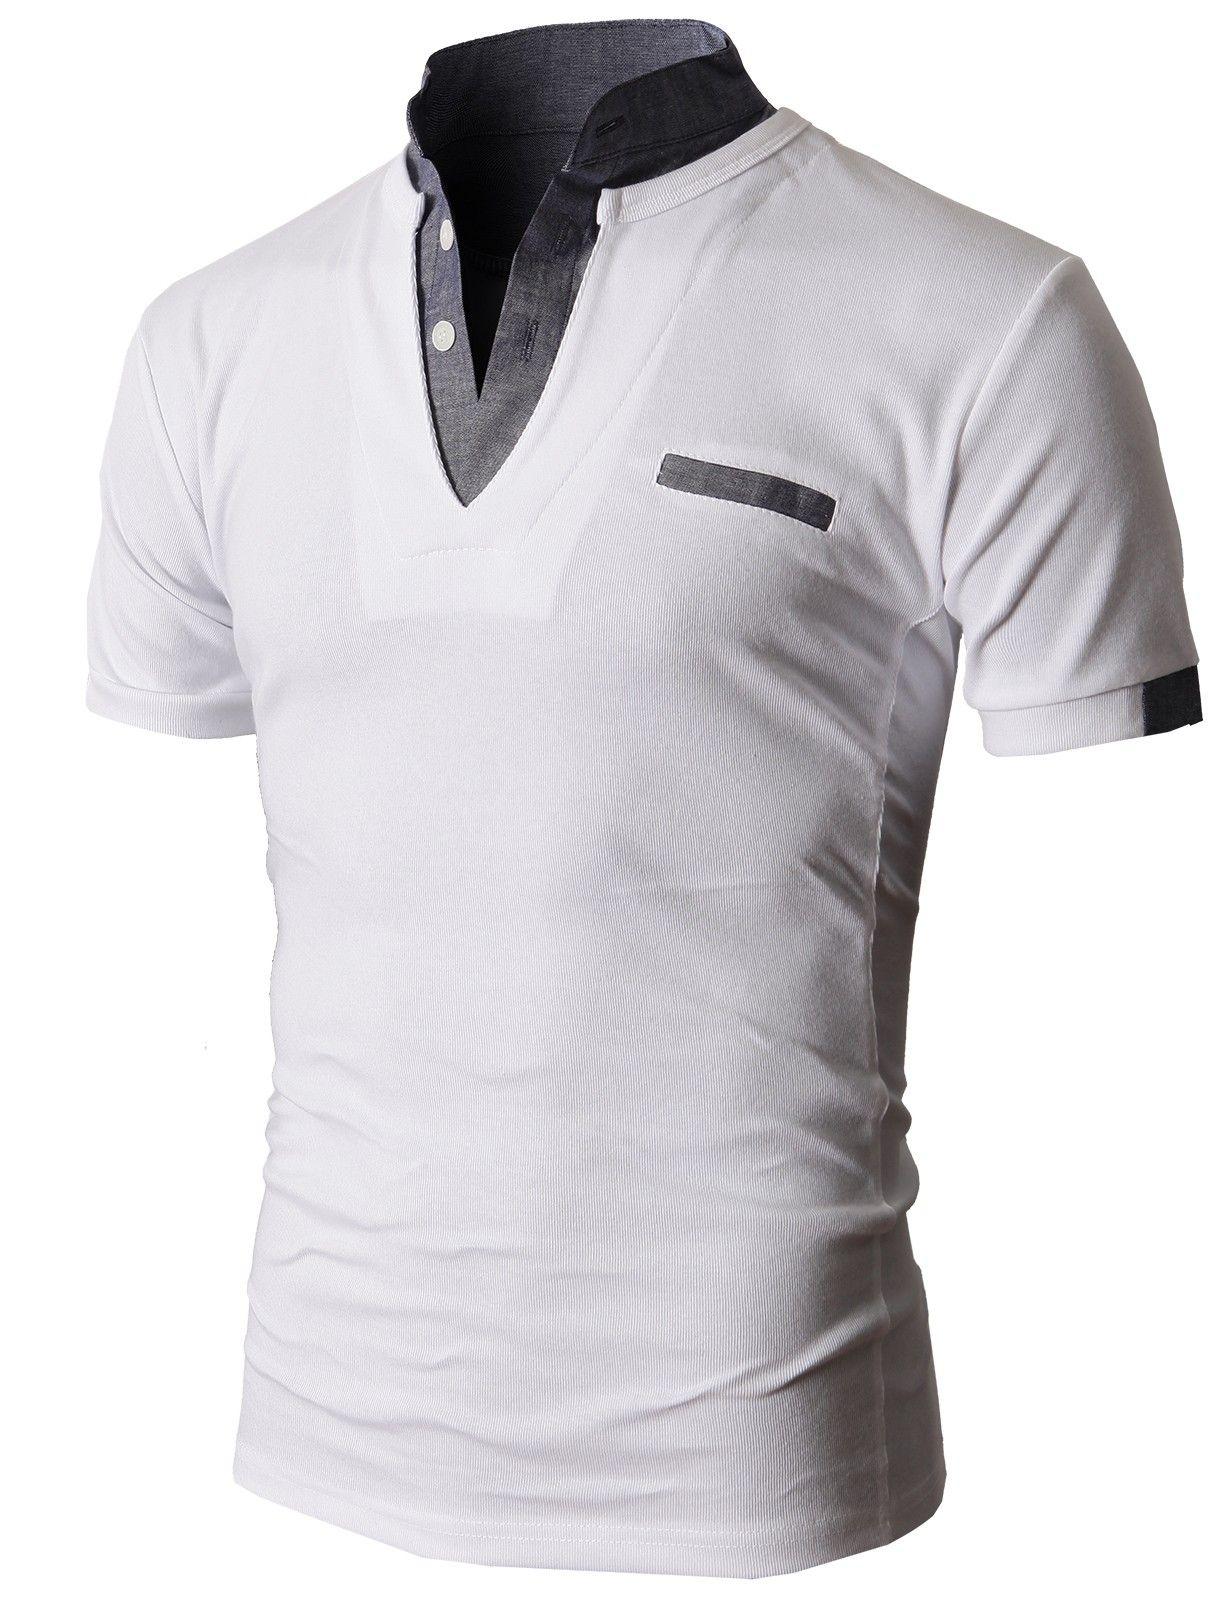 Doublju Men s Unique Hybrid Fashion Polo Shirts with Short Sleeve  (KMTTS0100)  doublju e7d058dfd